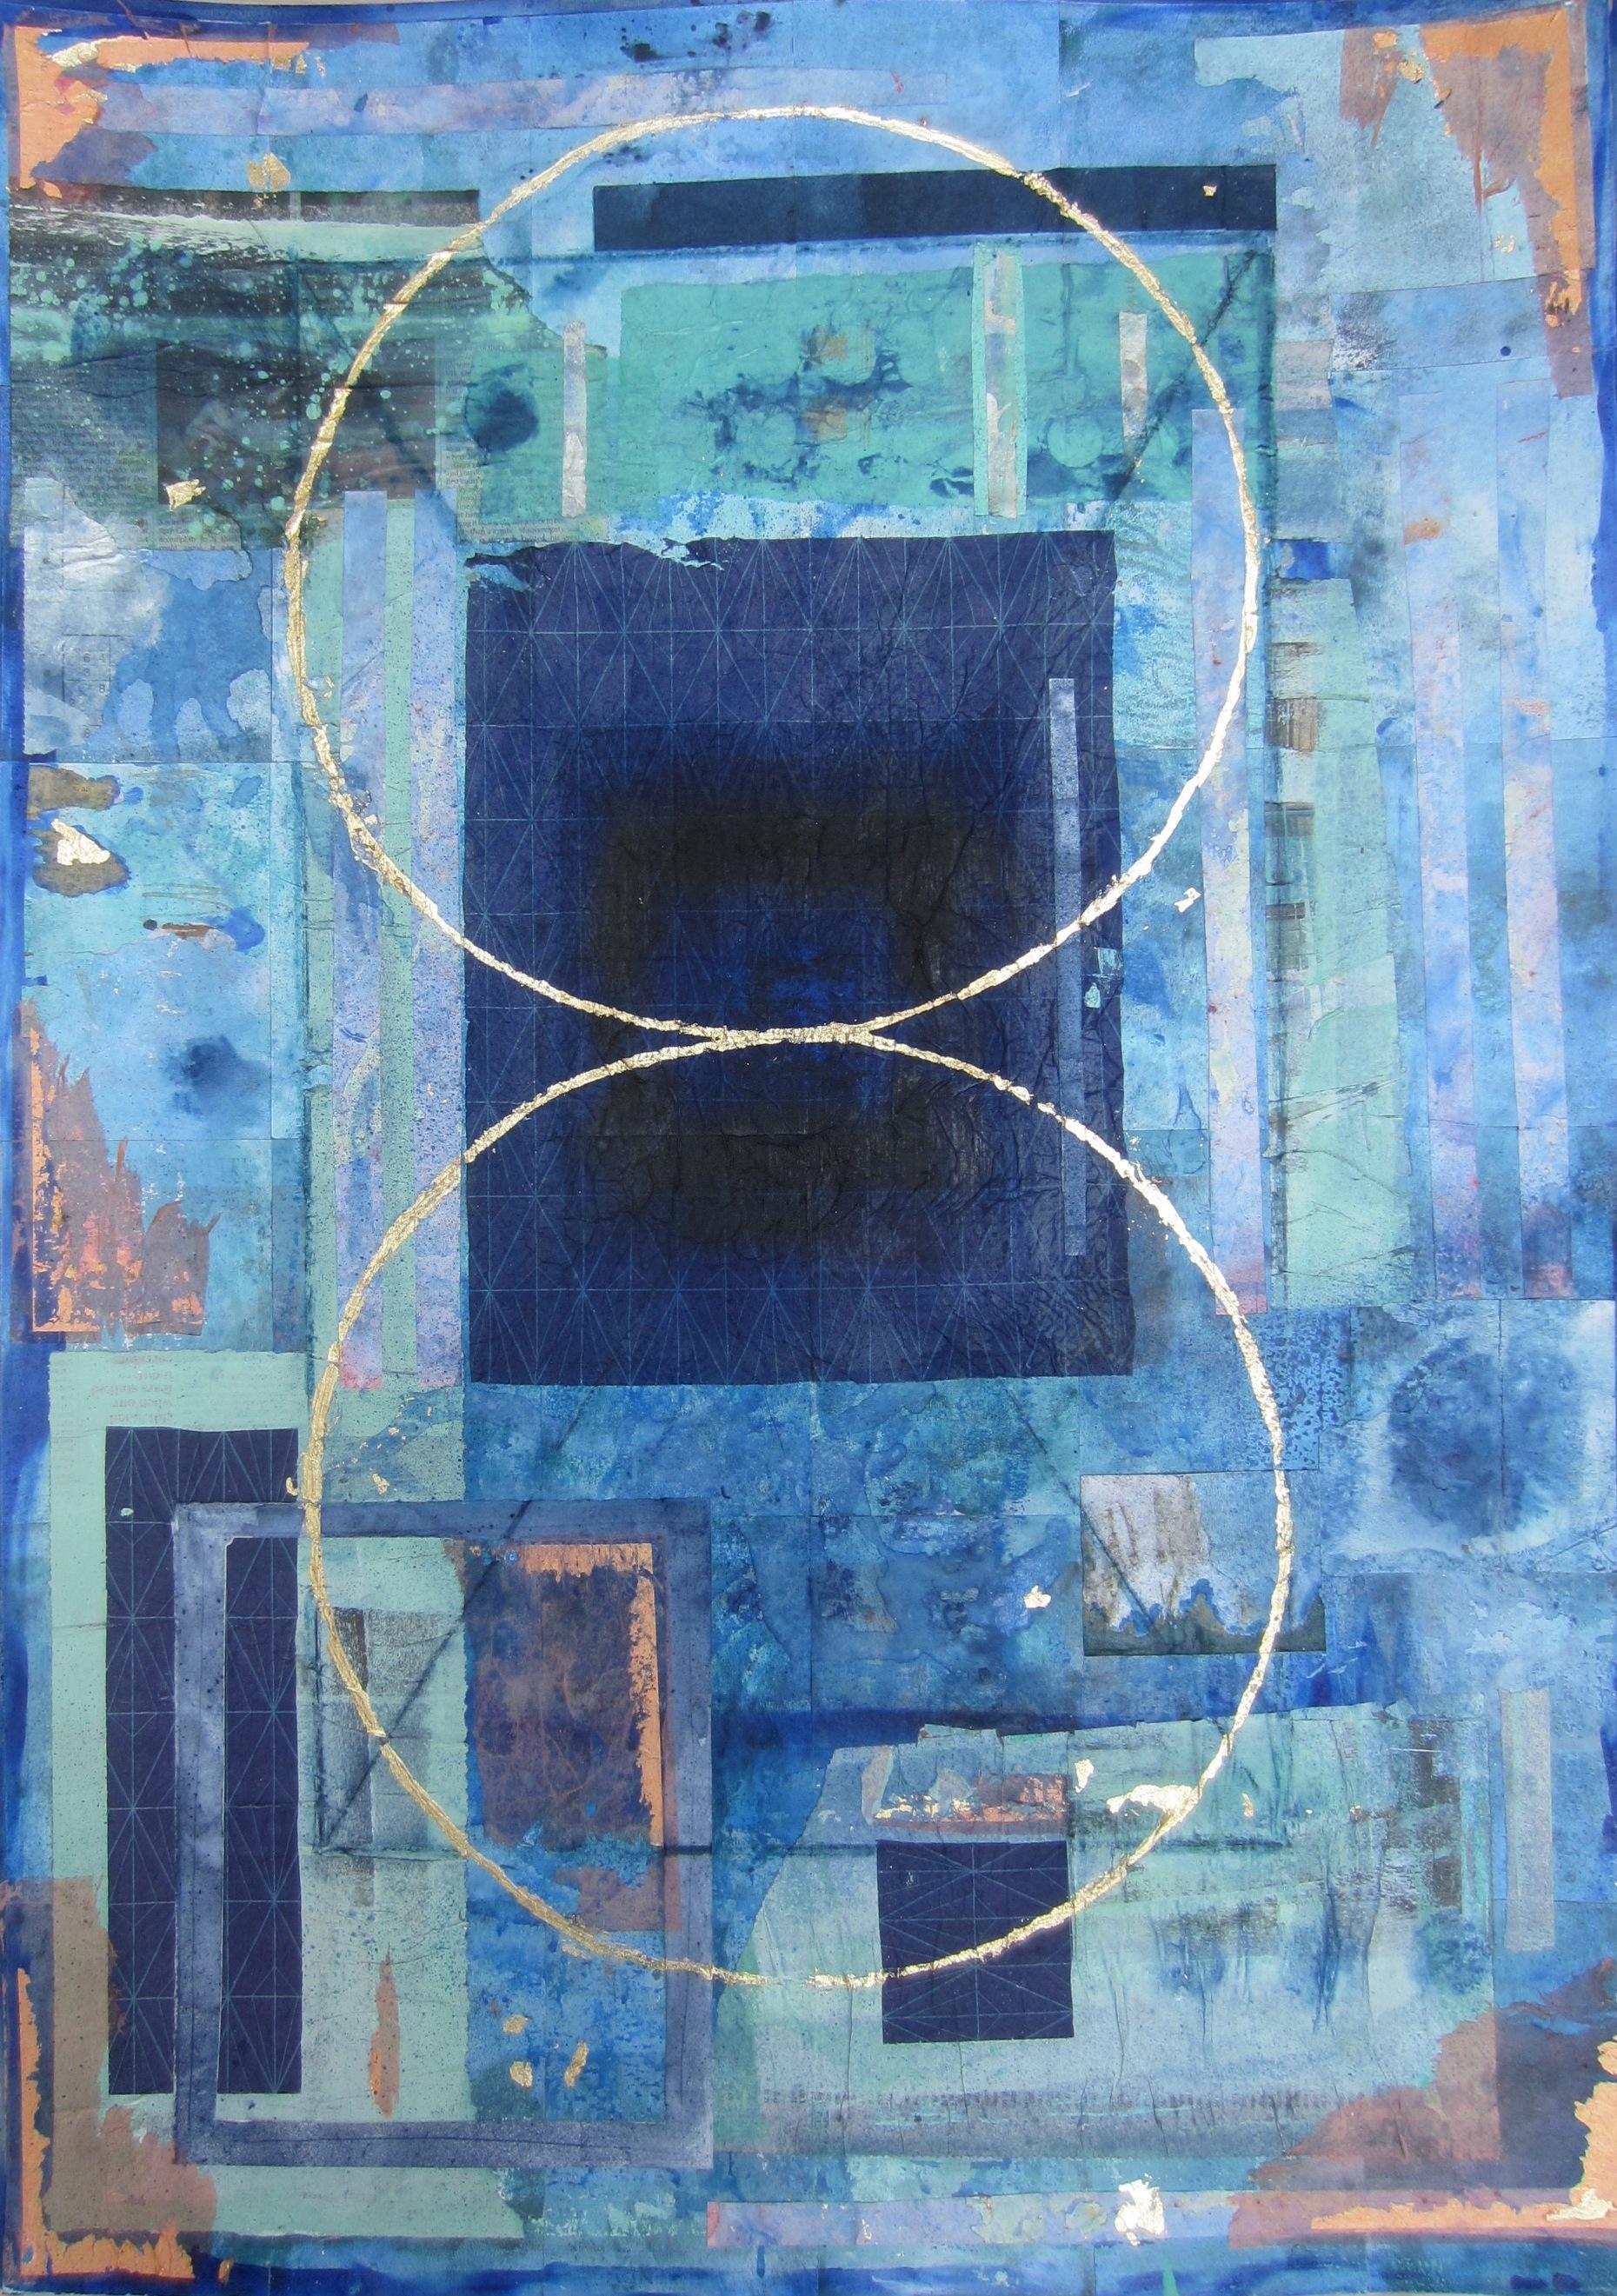 Jill Tattersall 2018'Alternative Worlds' (collage) 90x64 cm, showing at FLUX art exhibition